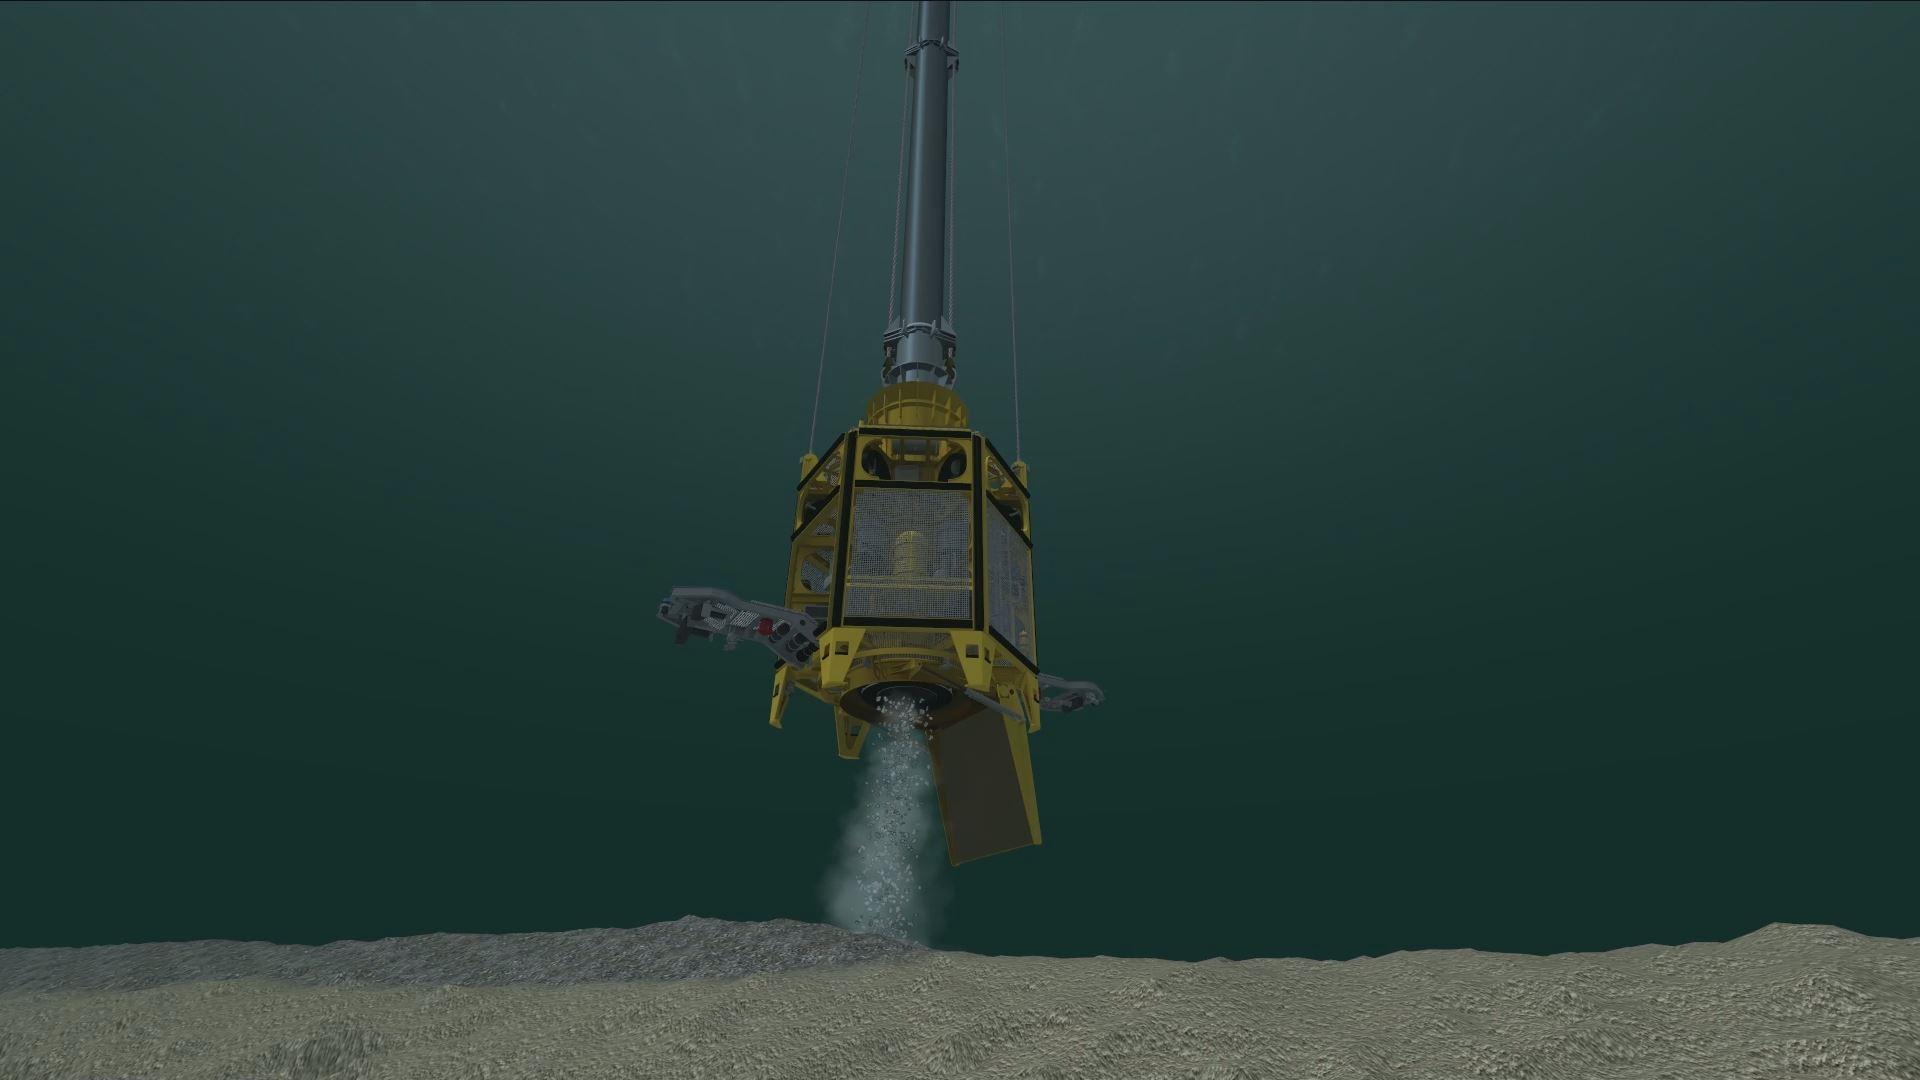 Joseph Plateau rov rock dumping simulation